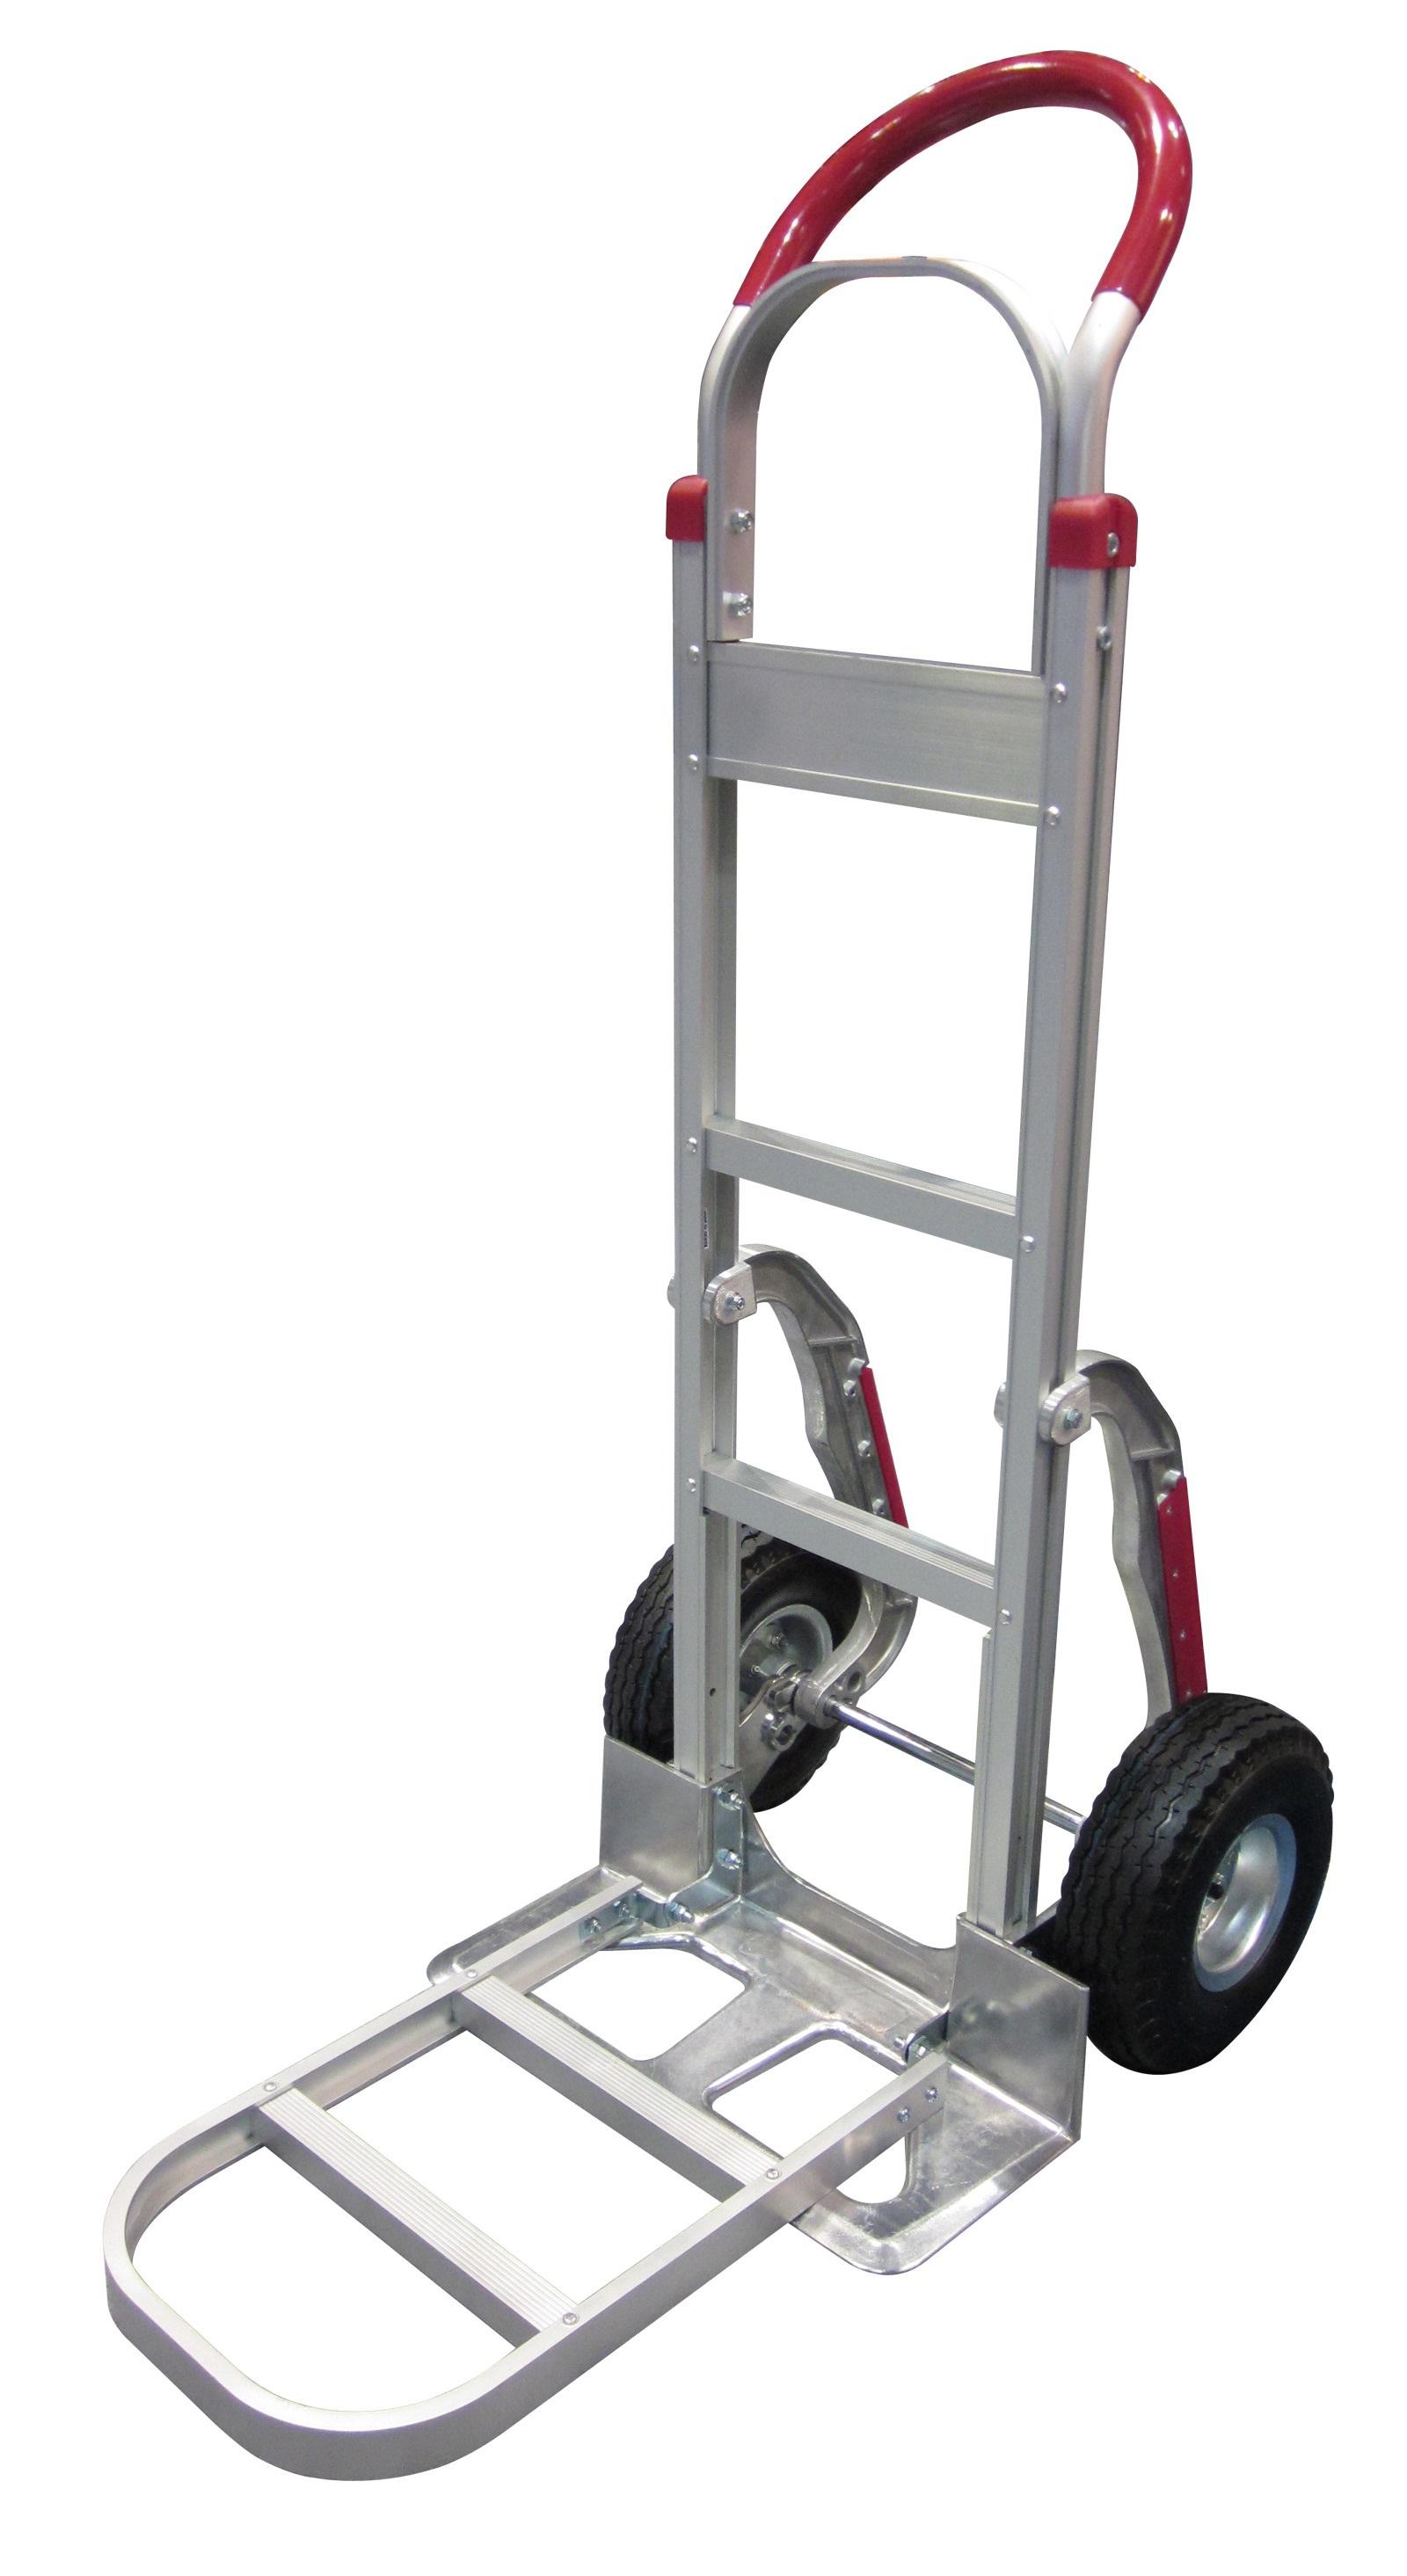 Hs 1 Aluminum Extension Nose Stair Climber